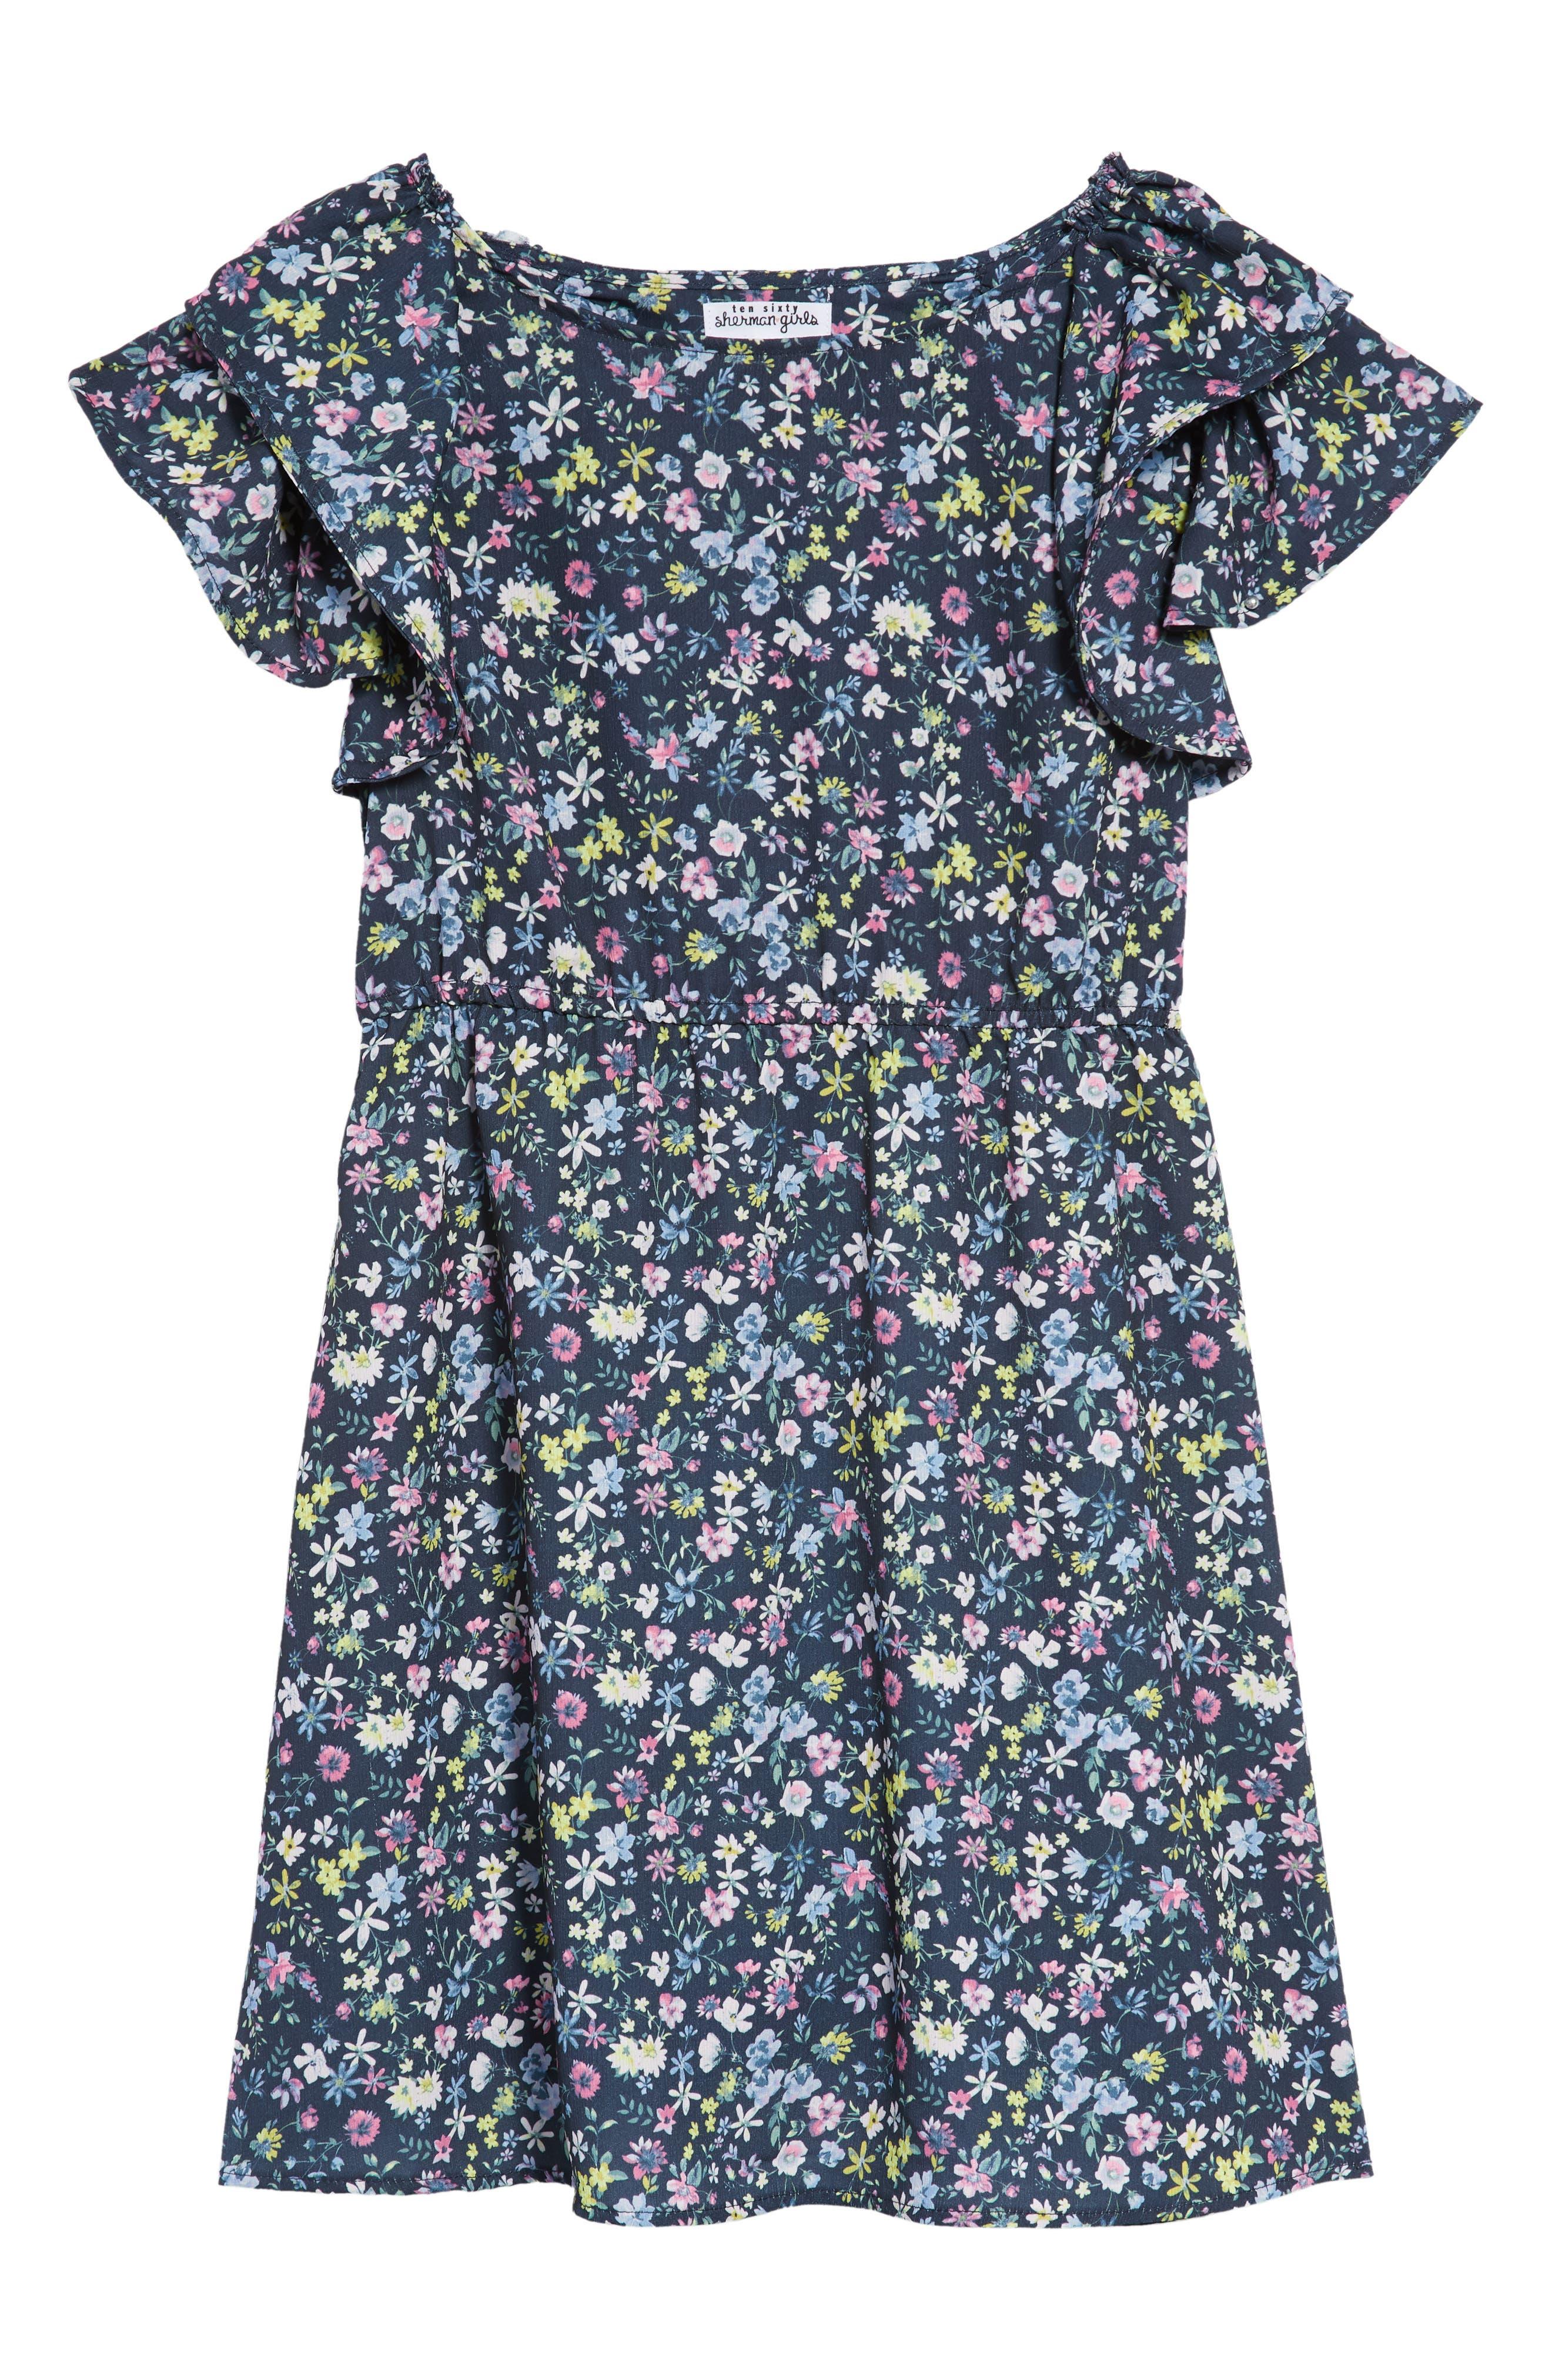 Ruffle Sleeve Floral Print Dress,                             Main thumbnail 1, color,                             420